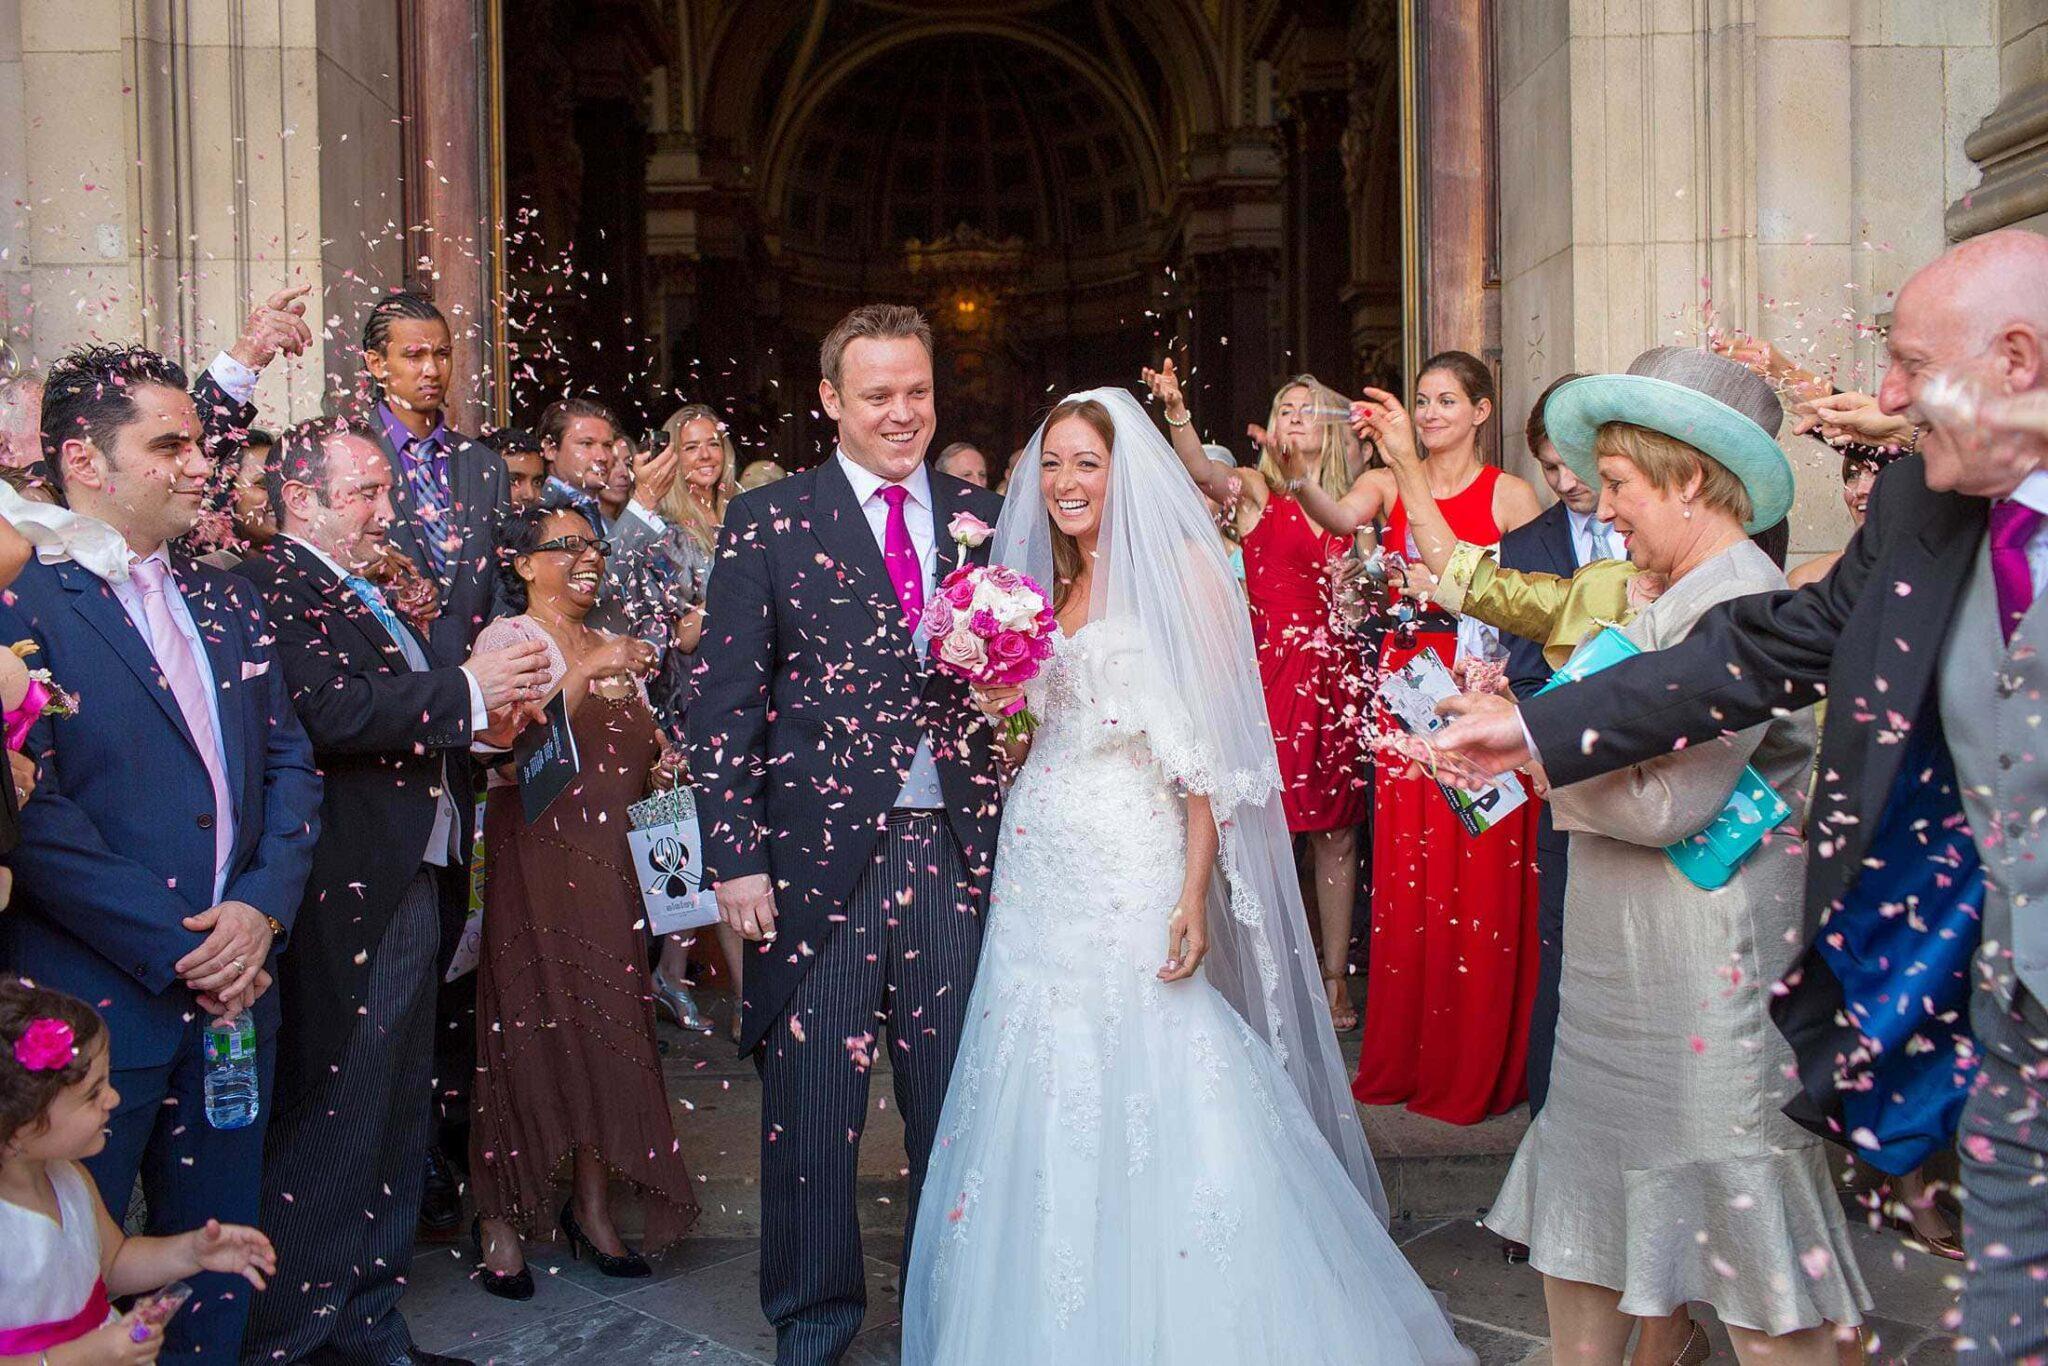 Ravens Ait wedding photographer | Debi & Ian